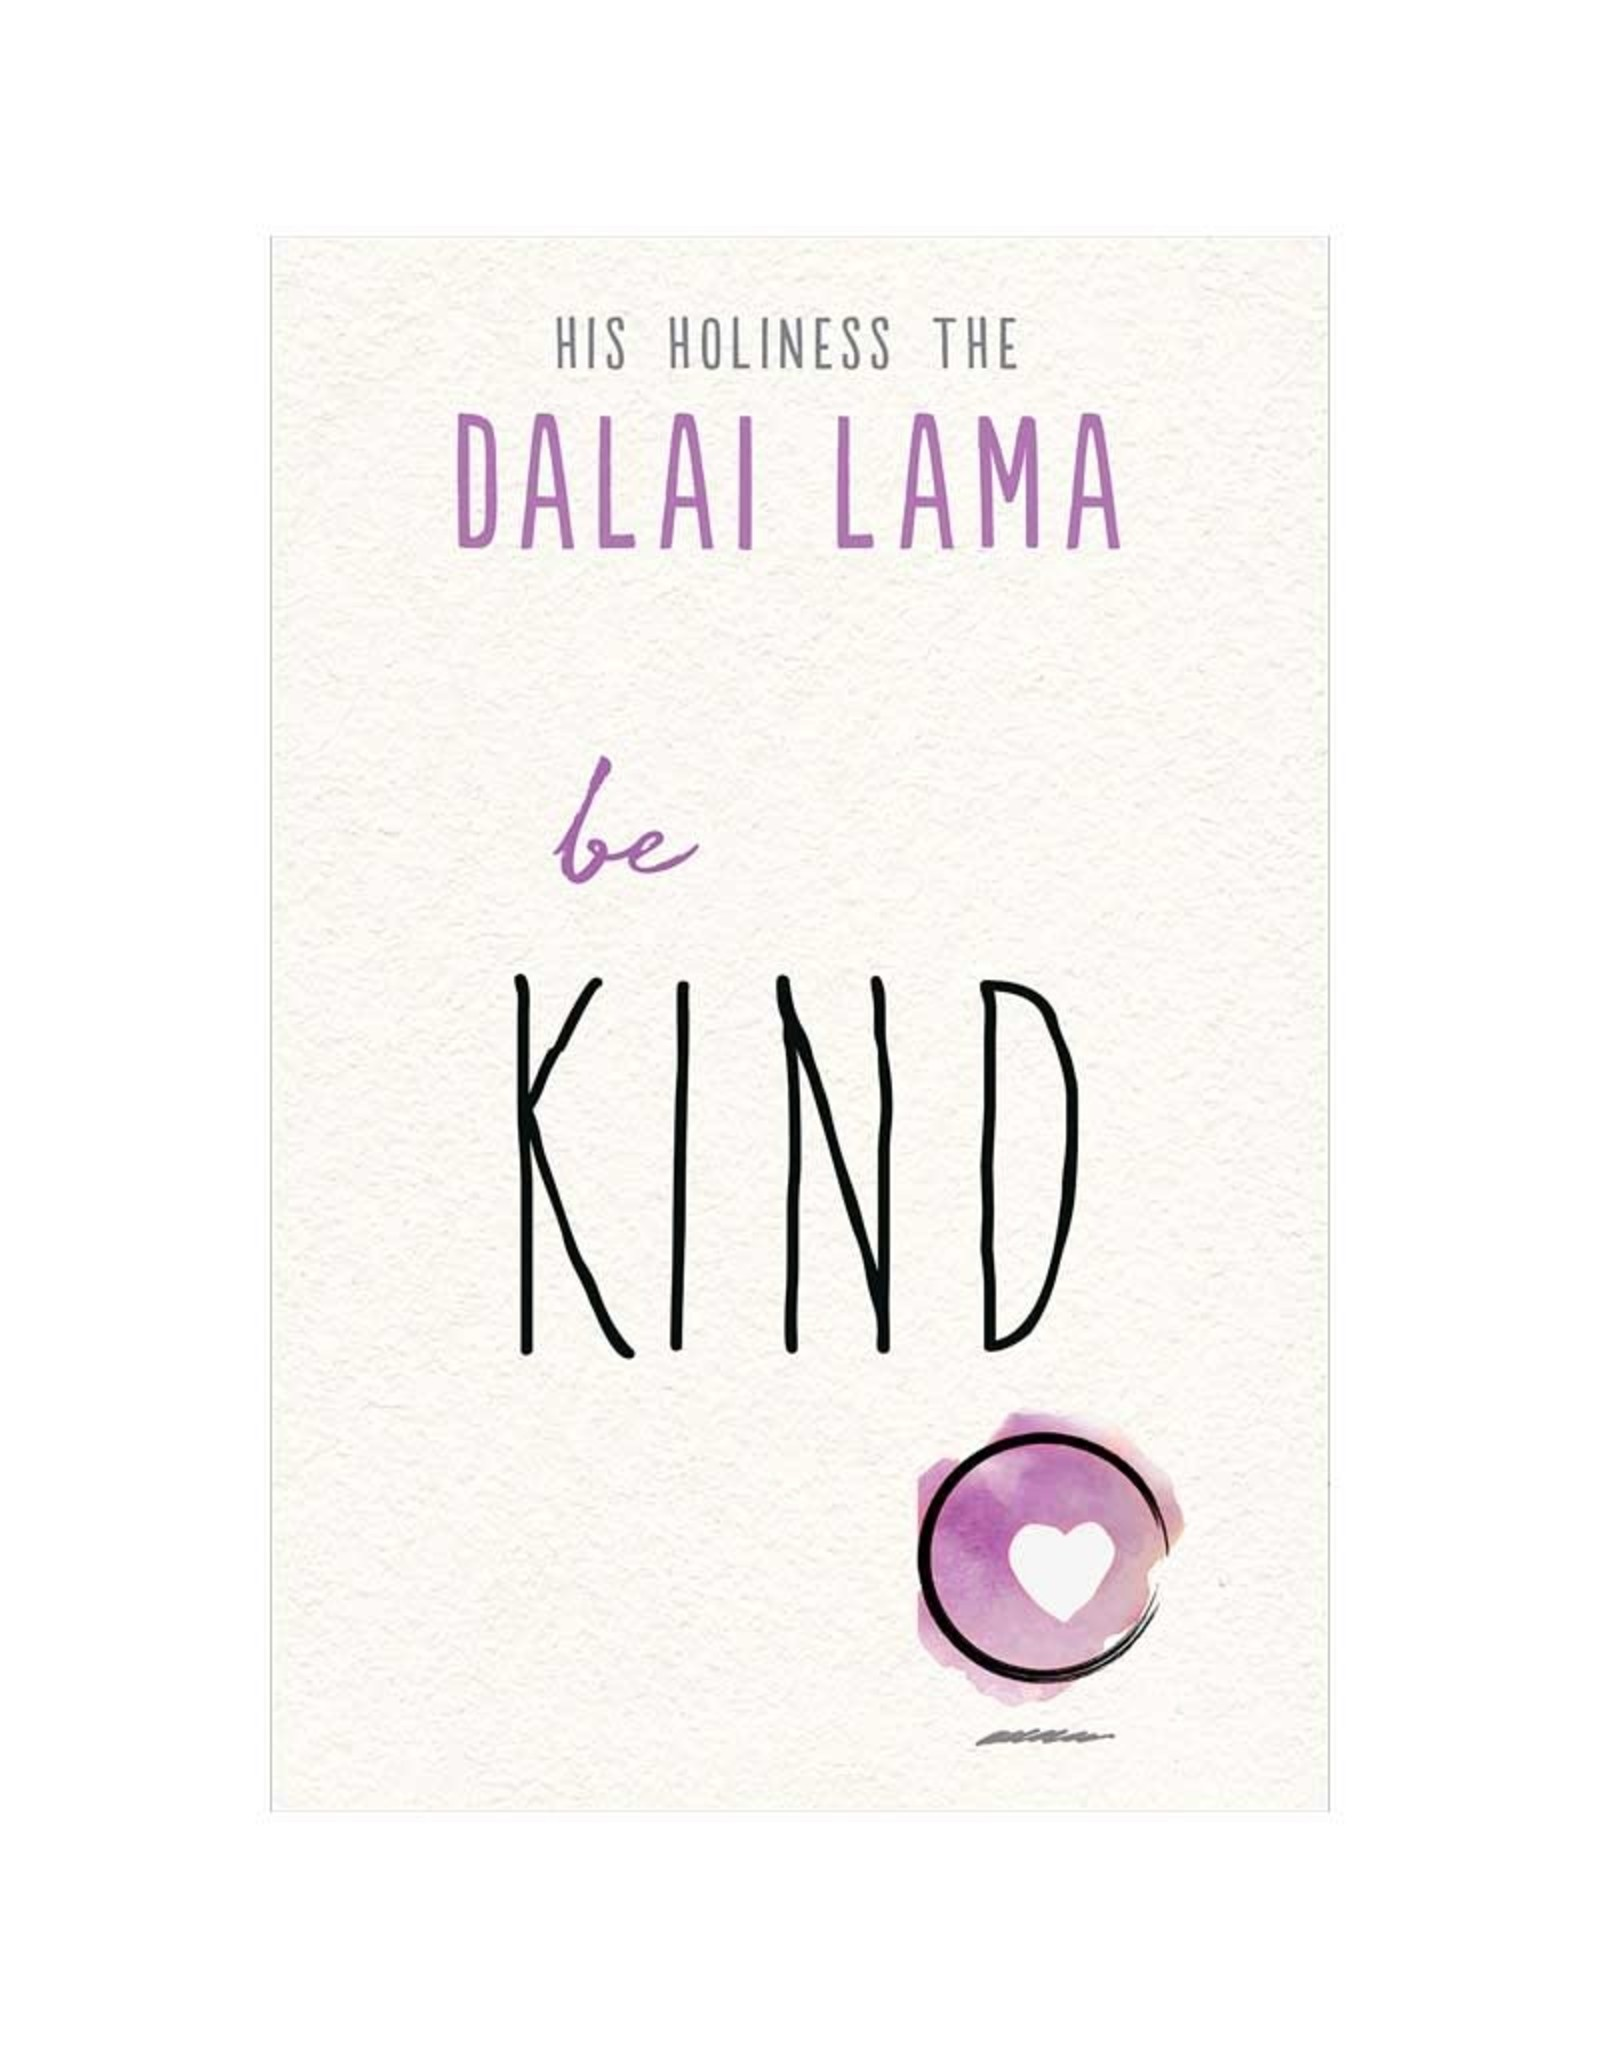 Be Kind by the Dalai Lama